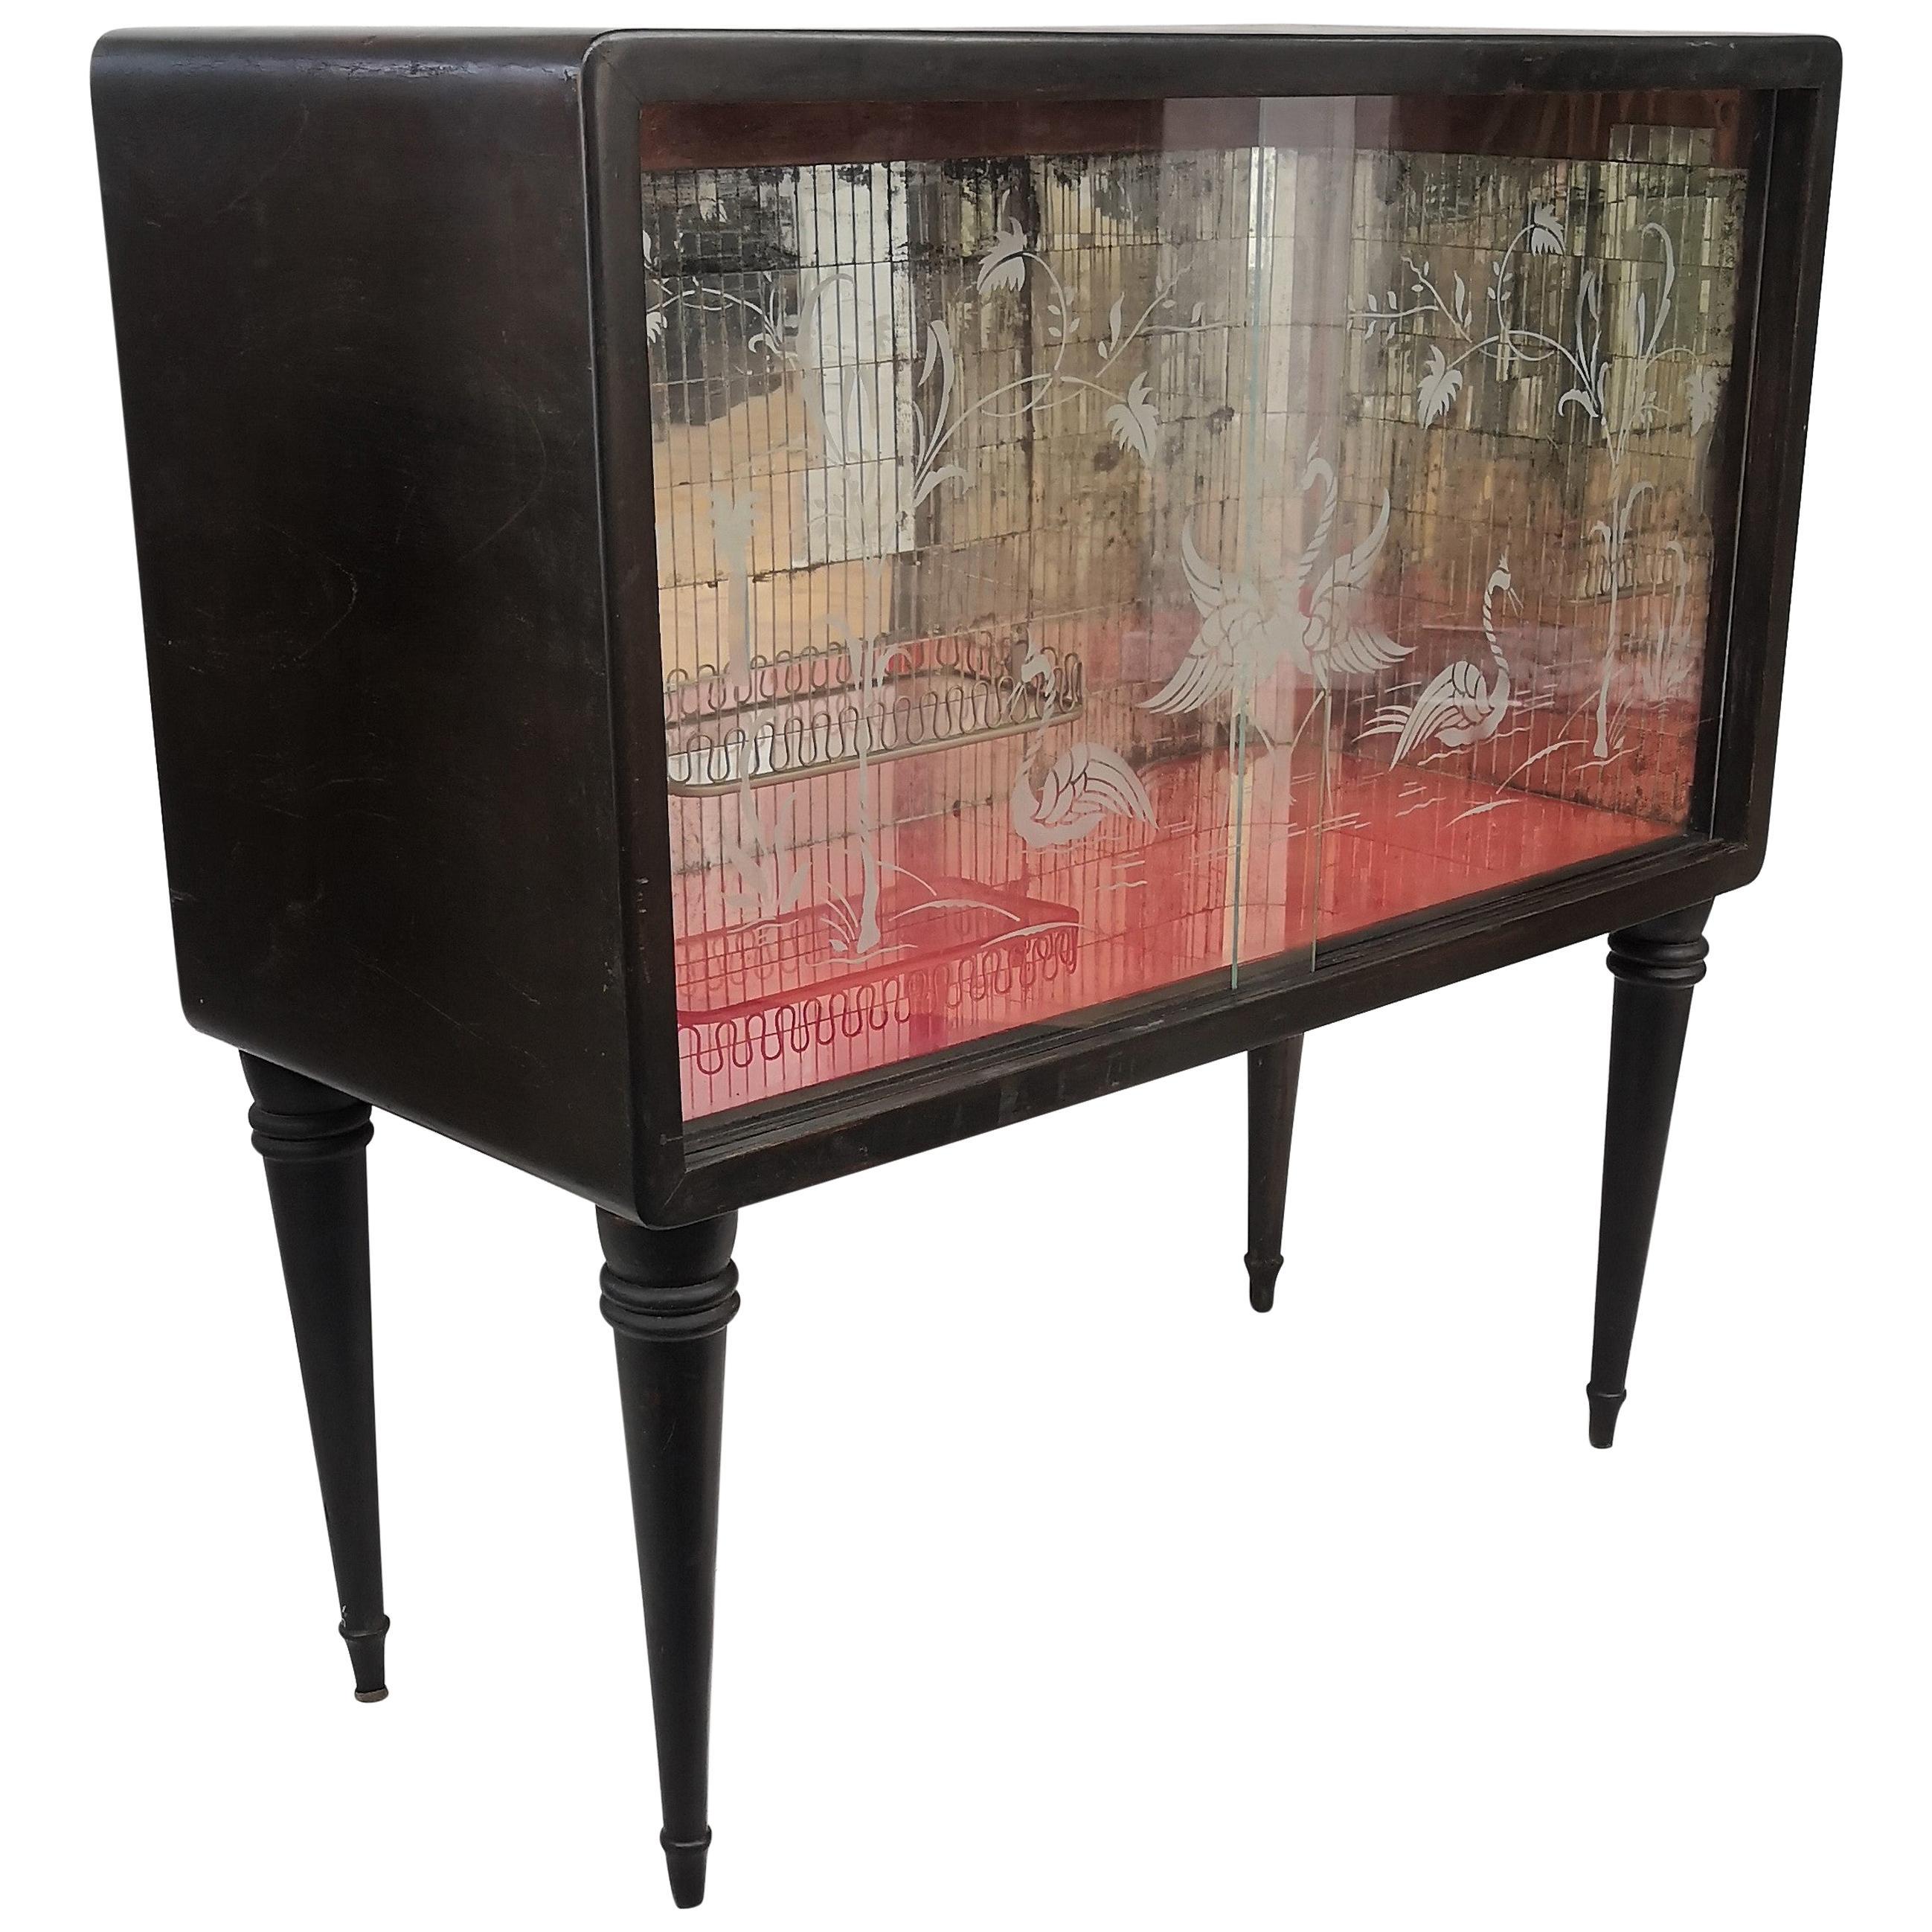 1960s Art Deco Midcentury Regency Italian Wood and Mirror Mosaic Dry Bar Cabinet